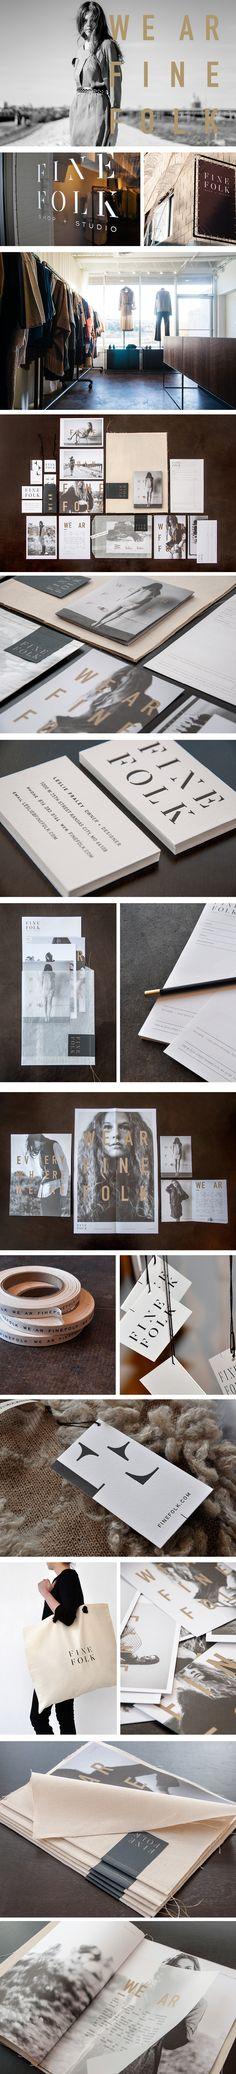 Fine Folk | Art Direction, Branding, Business Collateral, Copywriting, Design, Marketing Materials, Name, Packaging, Signage, Website | Design Ranch